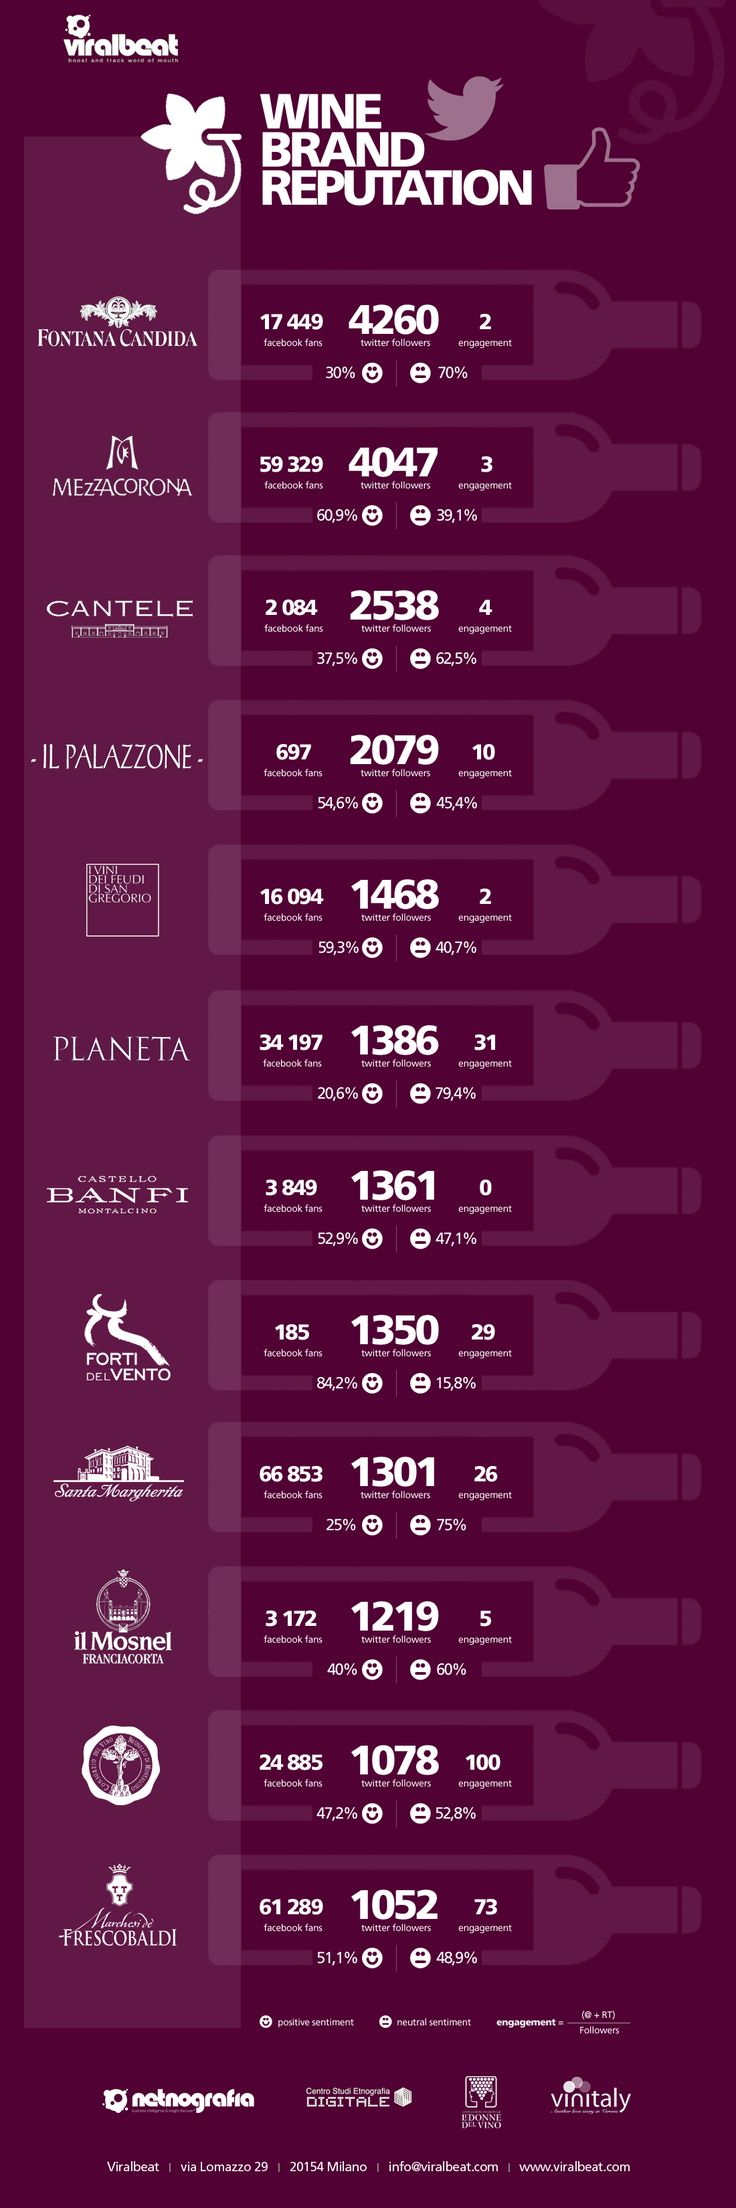 #Netnografia: la #brandreputation dei #topplayer del #vino in #Italia | #italianwine #wine